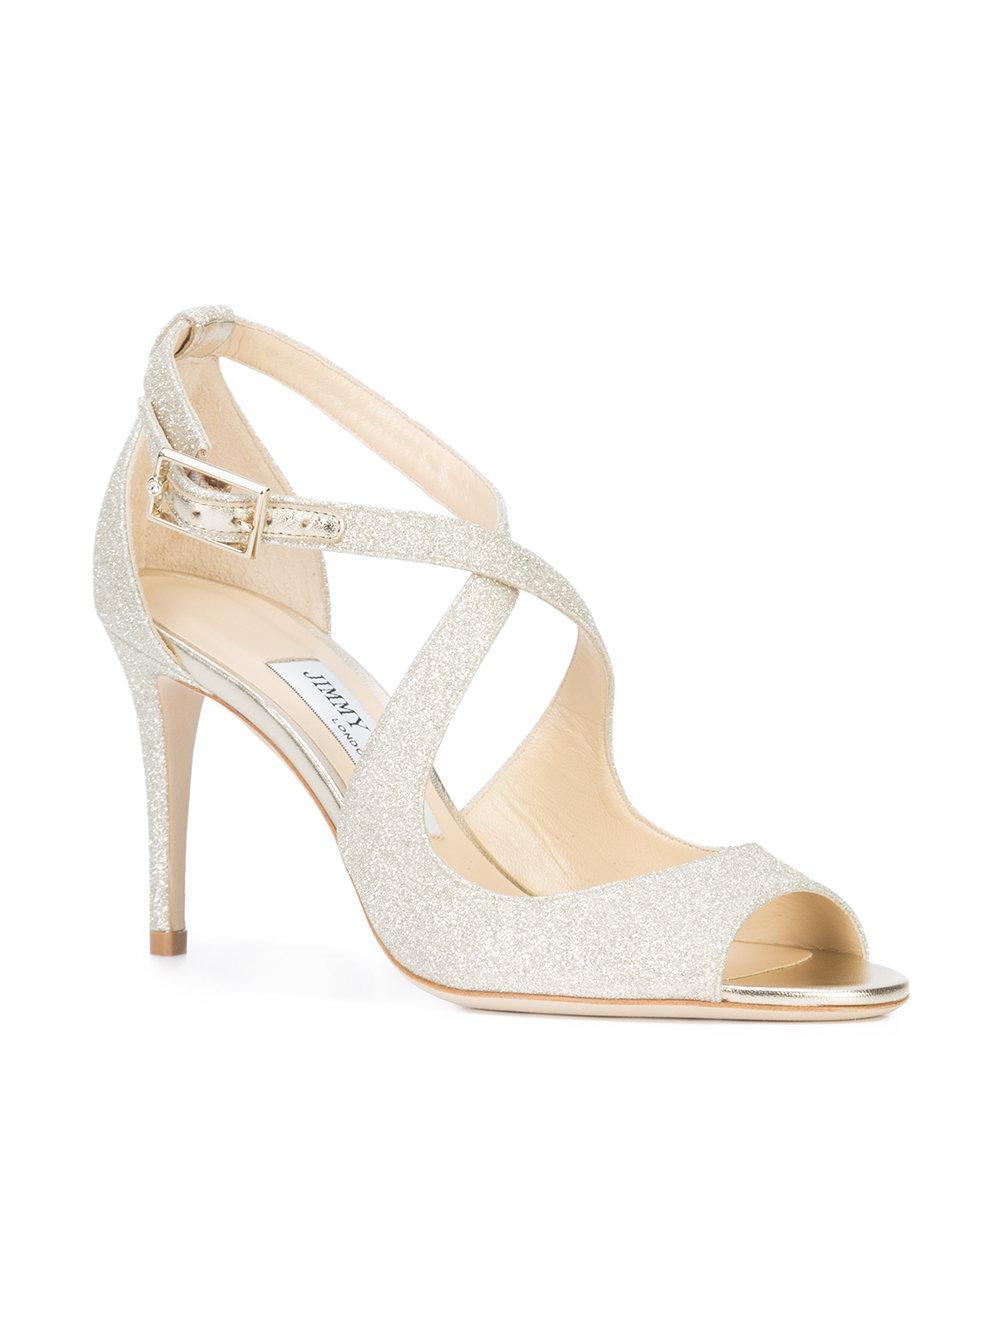 16b95c308878 Jimmy Choo Emily 85 Sandals in Metallic - Save 14.94845360824742% - Lyst